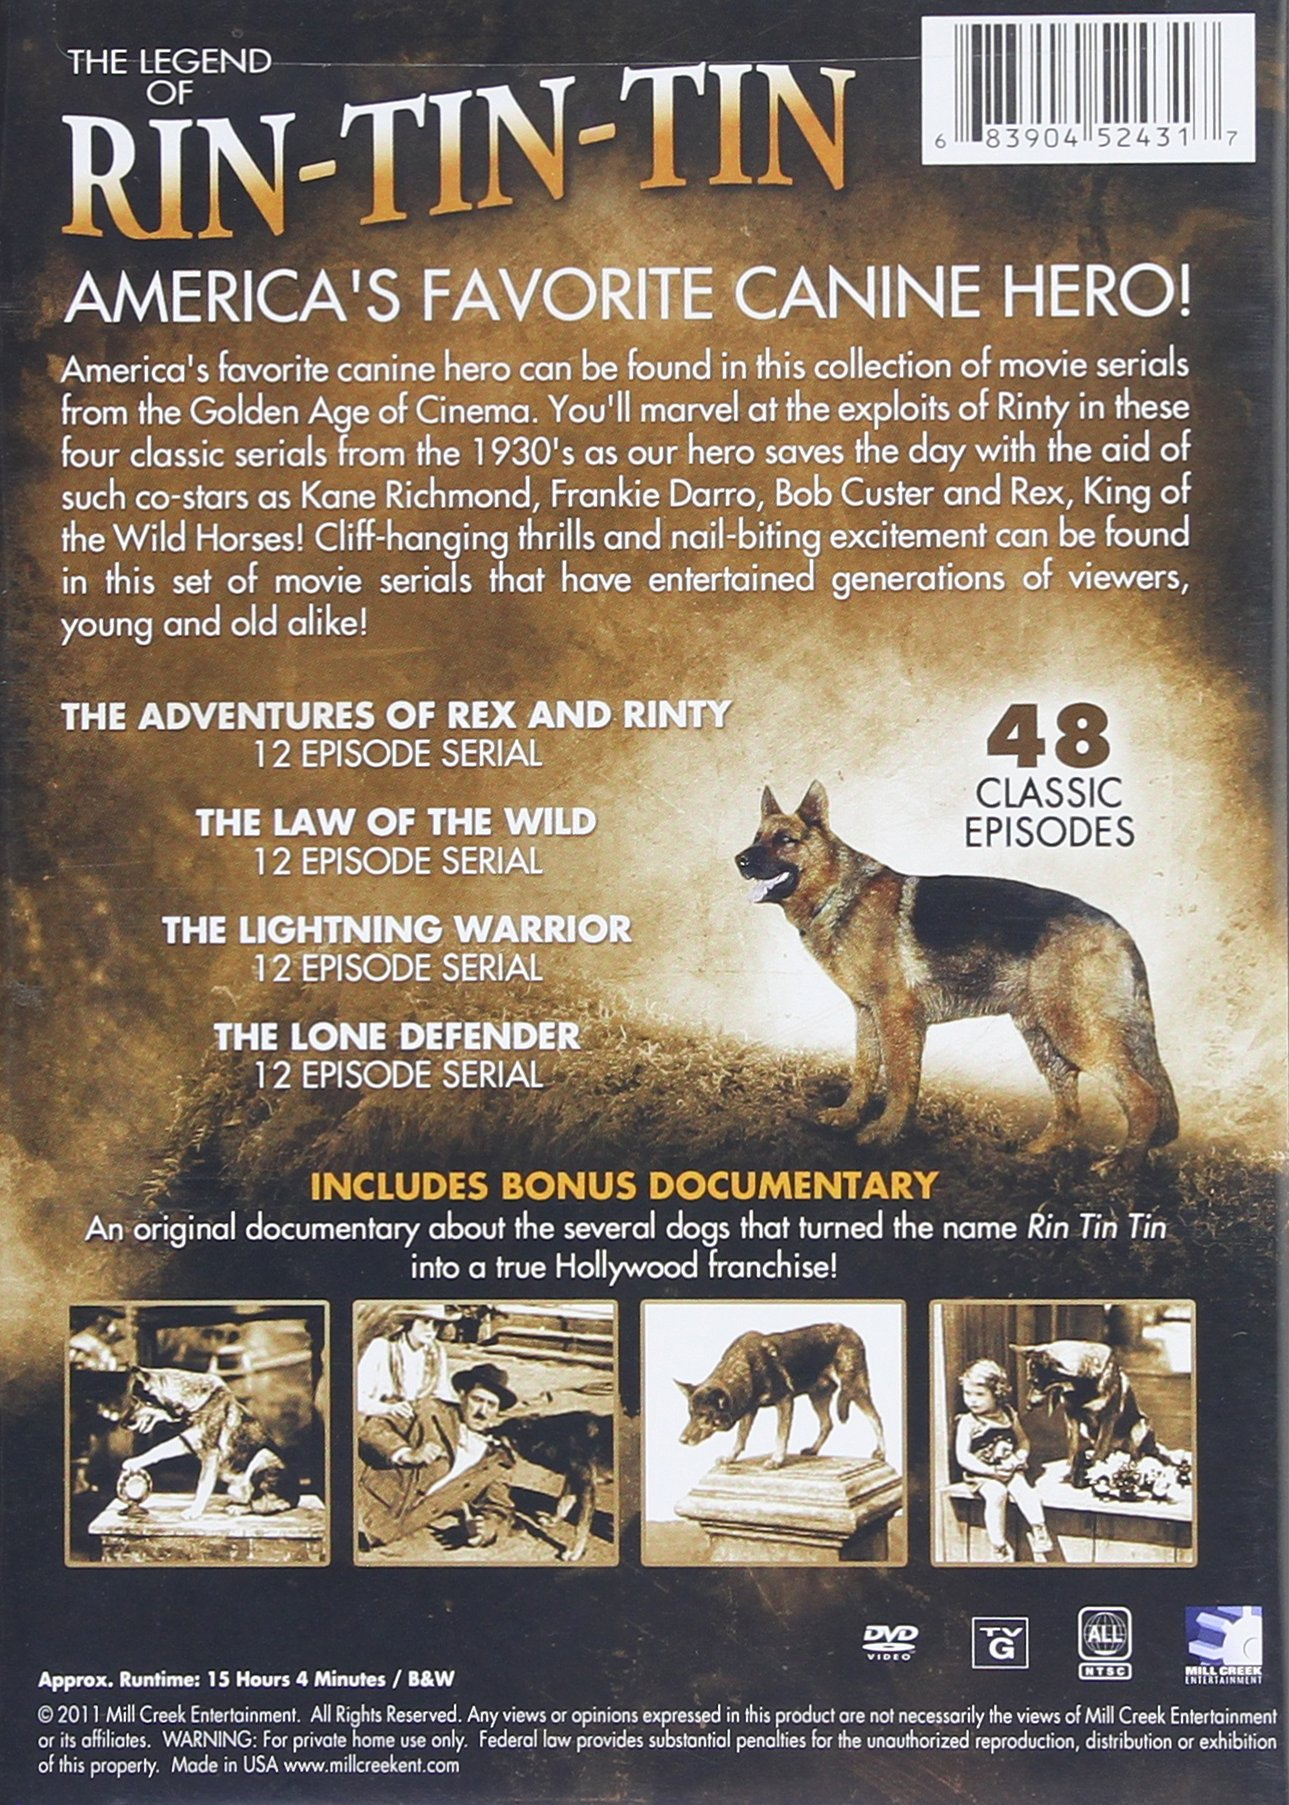 The Legend of Rin-Tin-Tin: America's Favorite Canine Hero